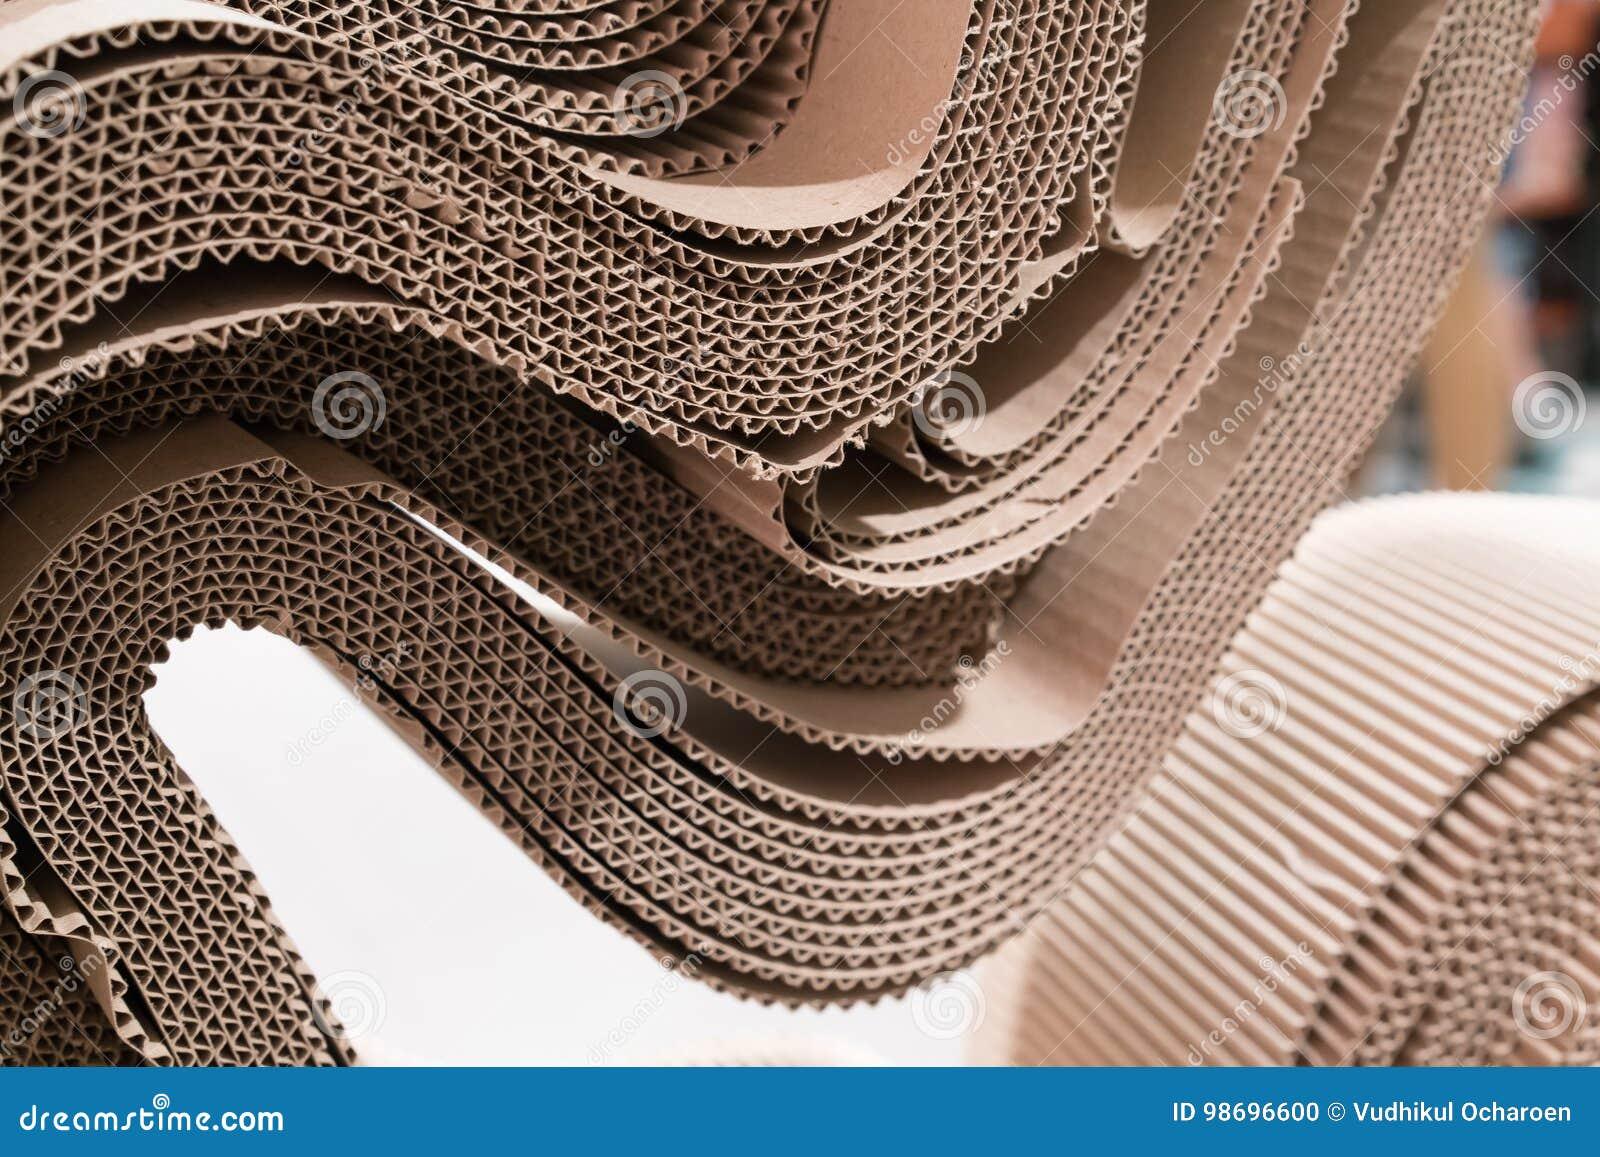 Roll of wavy craft paper folded in random stock photo image of roll of wavy craft paper folded in random jeuxipadfo Choice Image